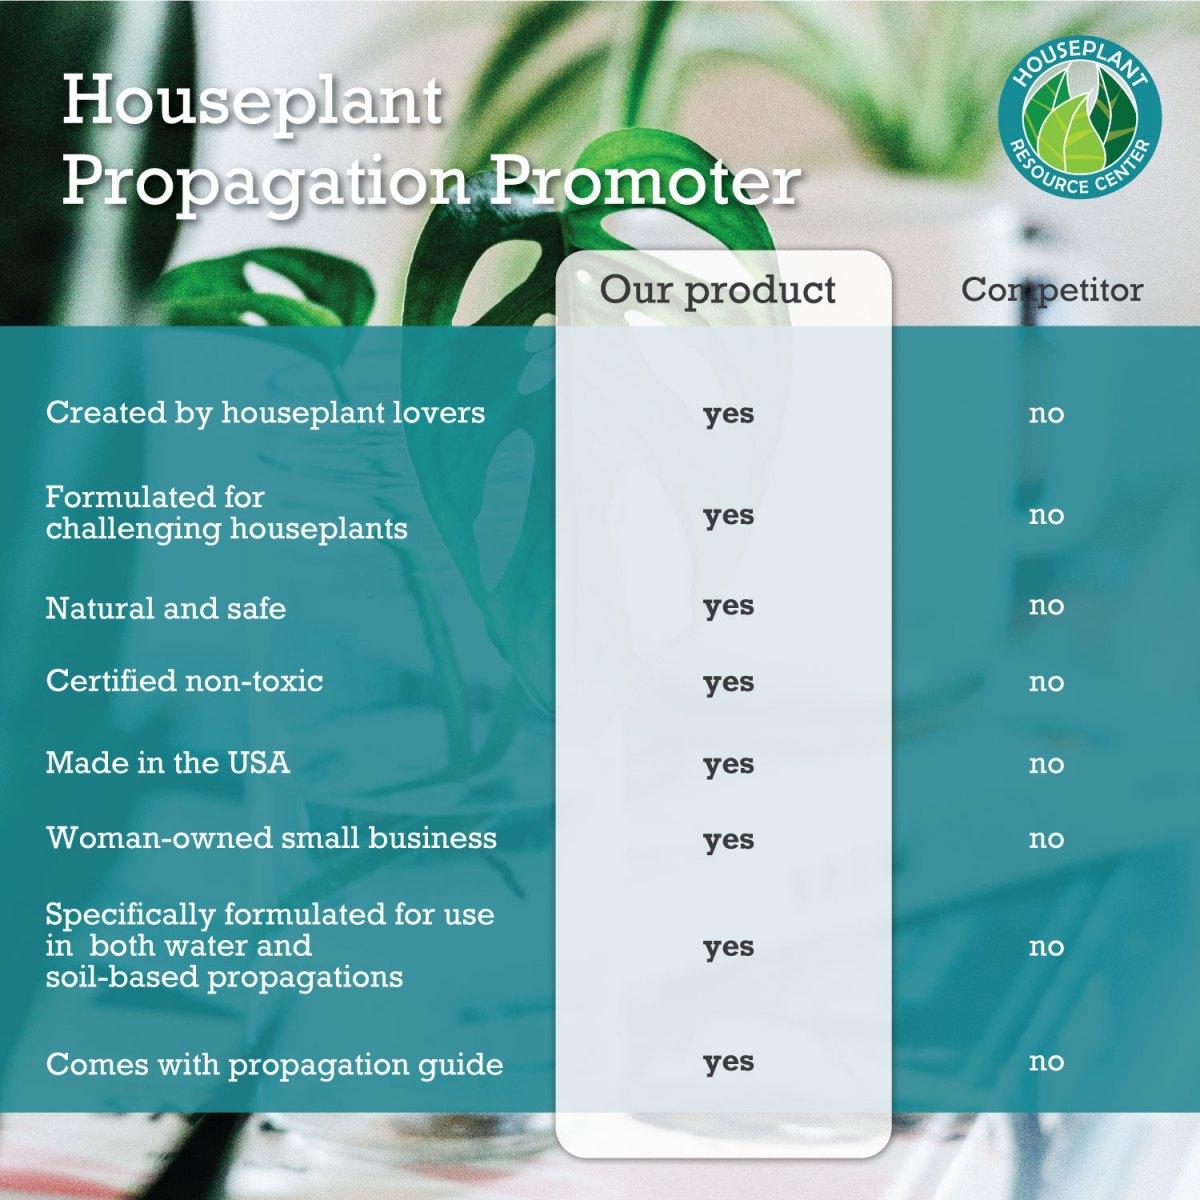 houseplant-propagation-promoter